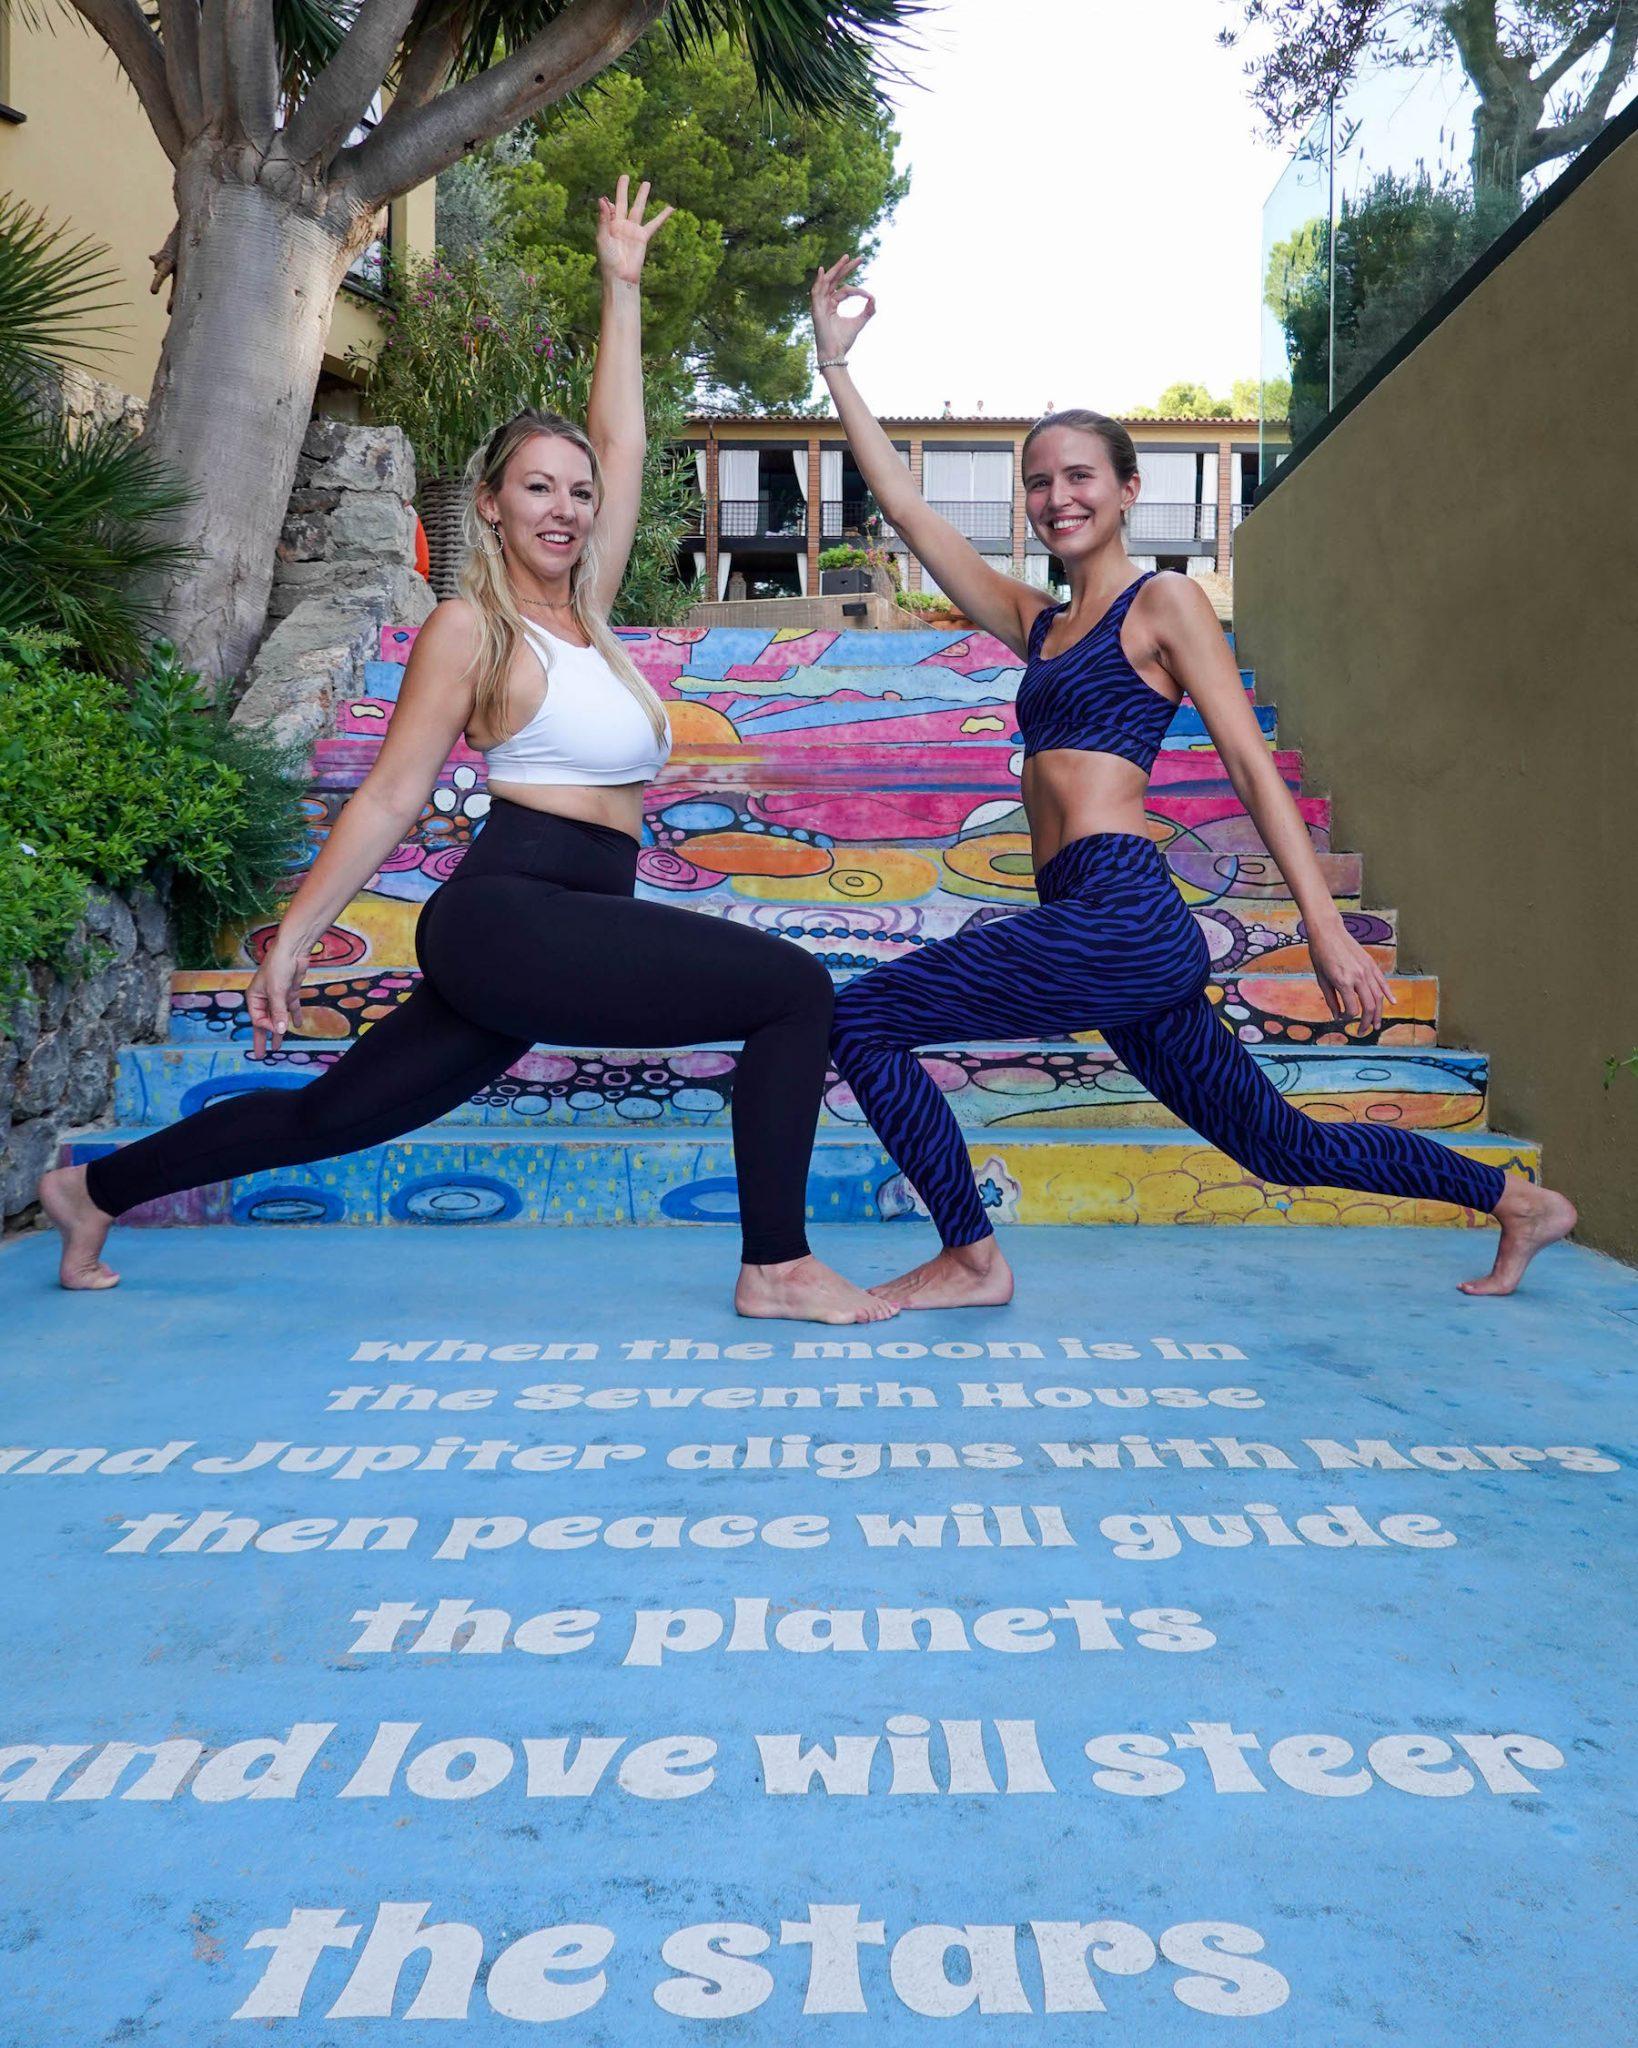 suelovesnyc_yoga_retreat_auf_mallorca_im_bikini_island_mountain_hotel_nicole_dechow